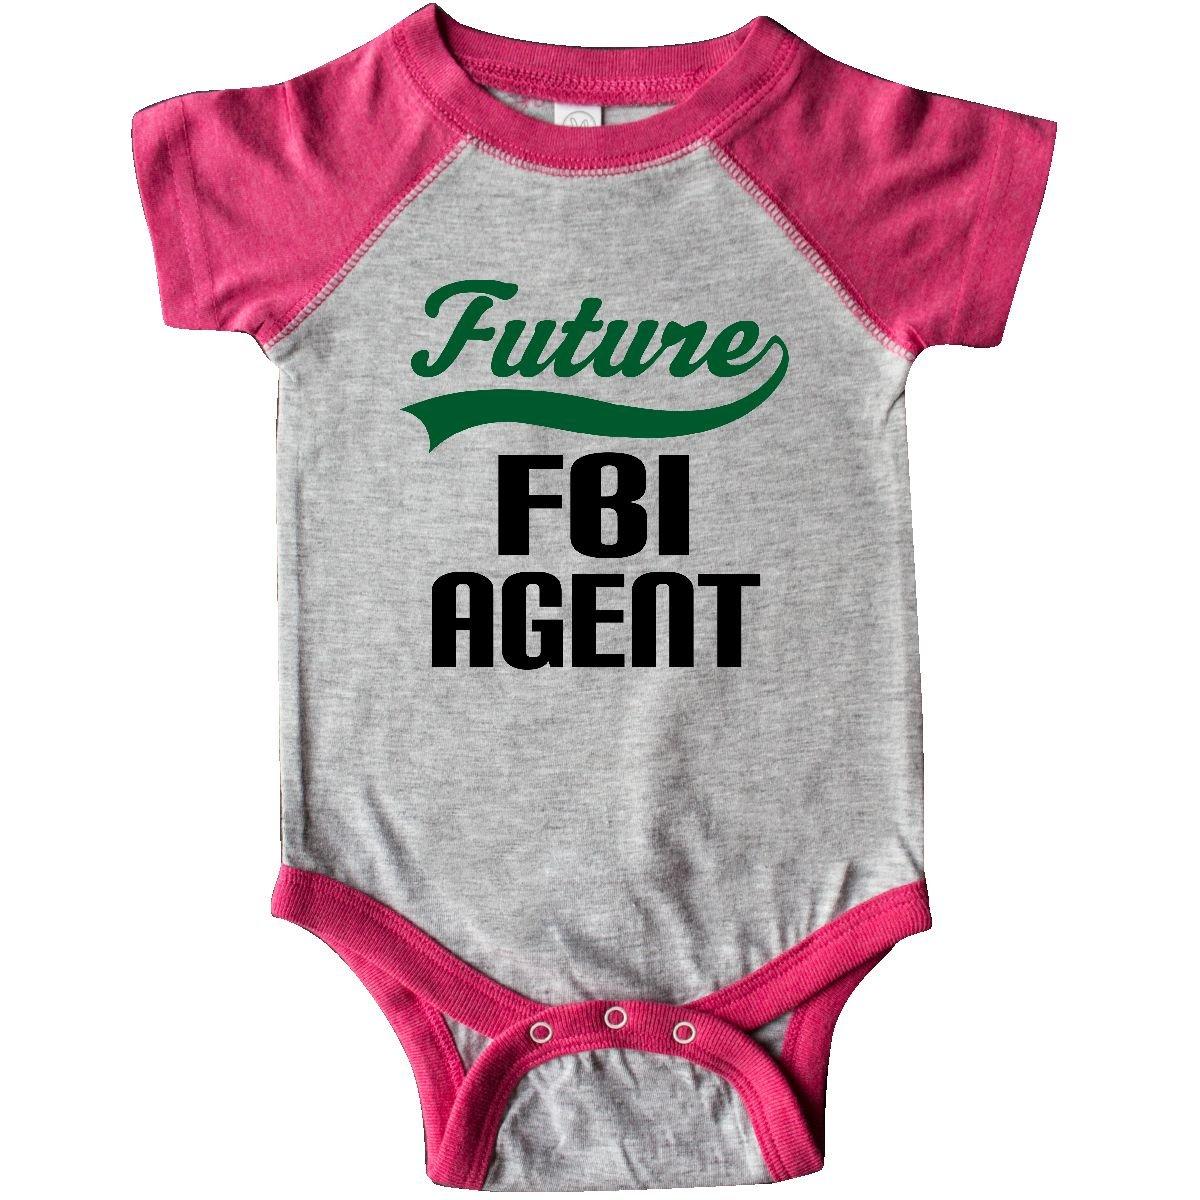 90e1fafe270 Amazon.com  inktastic - Future FBI Agent Childs Gift Infant Creeper 2de9f   Clothing